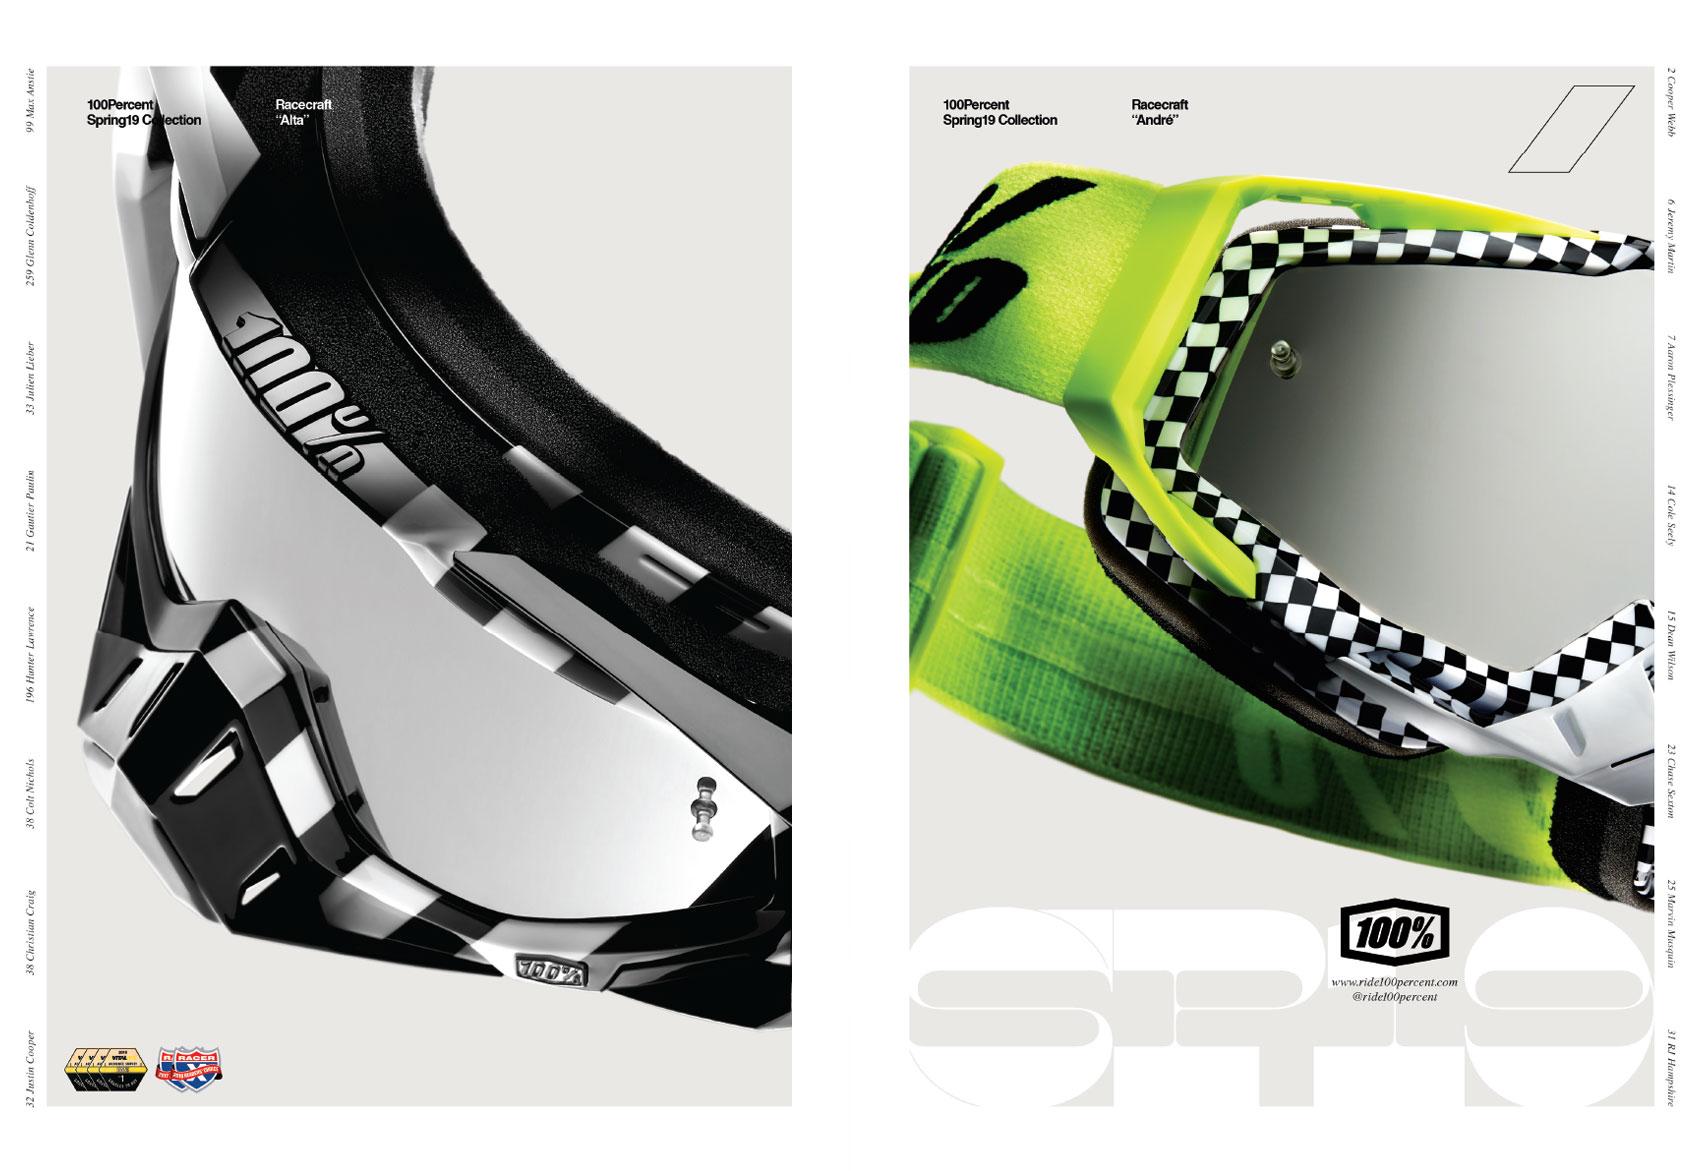 Racer X June 2019 - Ride 100 Percent Advertisement